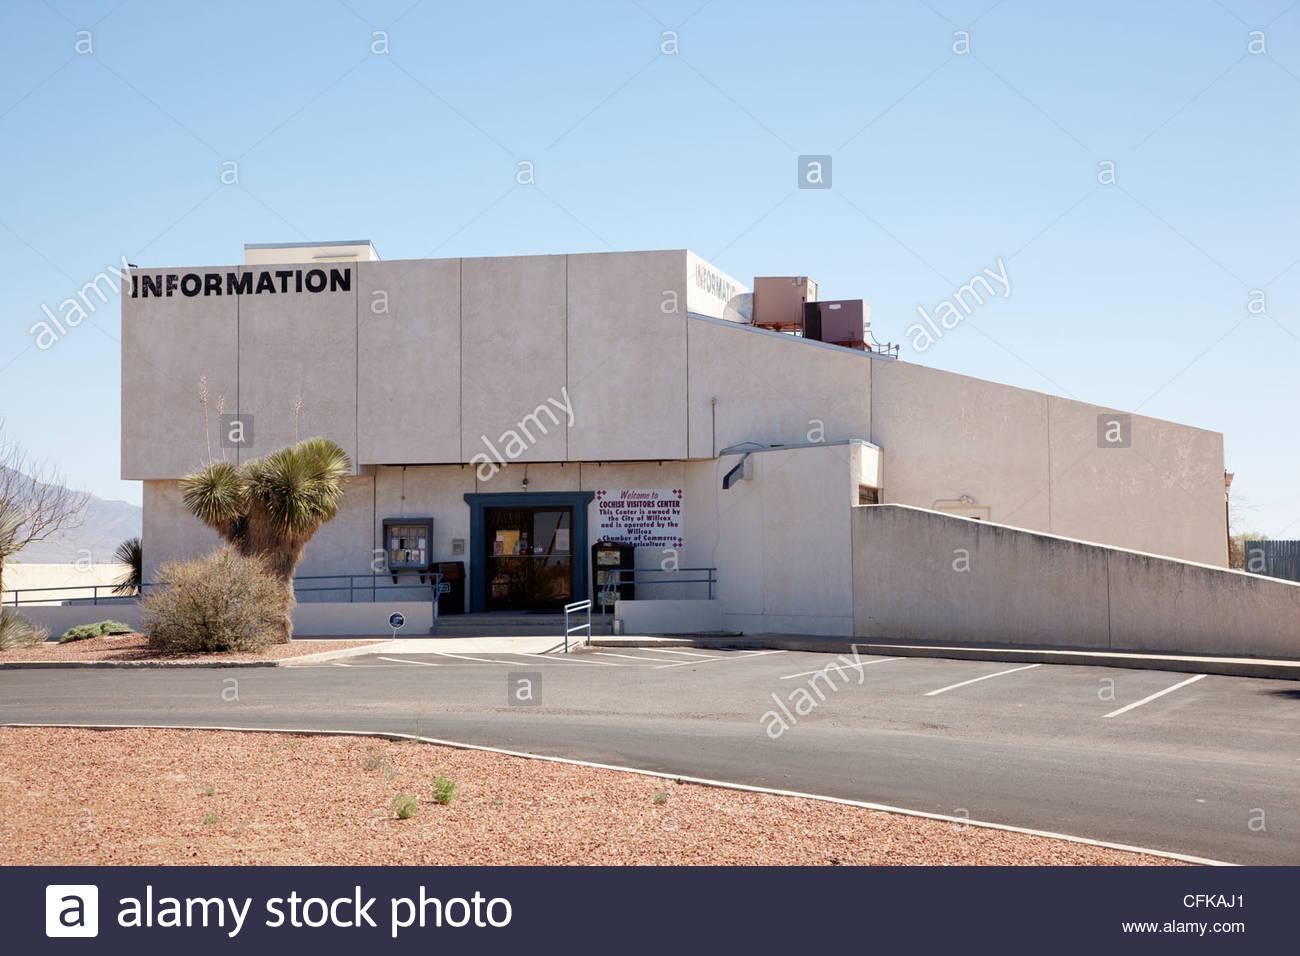 Arizona cochise county cochise - Cochise Visitors Center Willcox Arizona Cochise County Visitor S Information